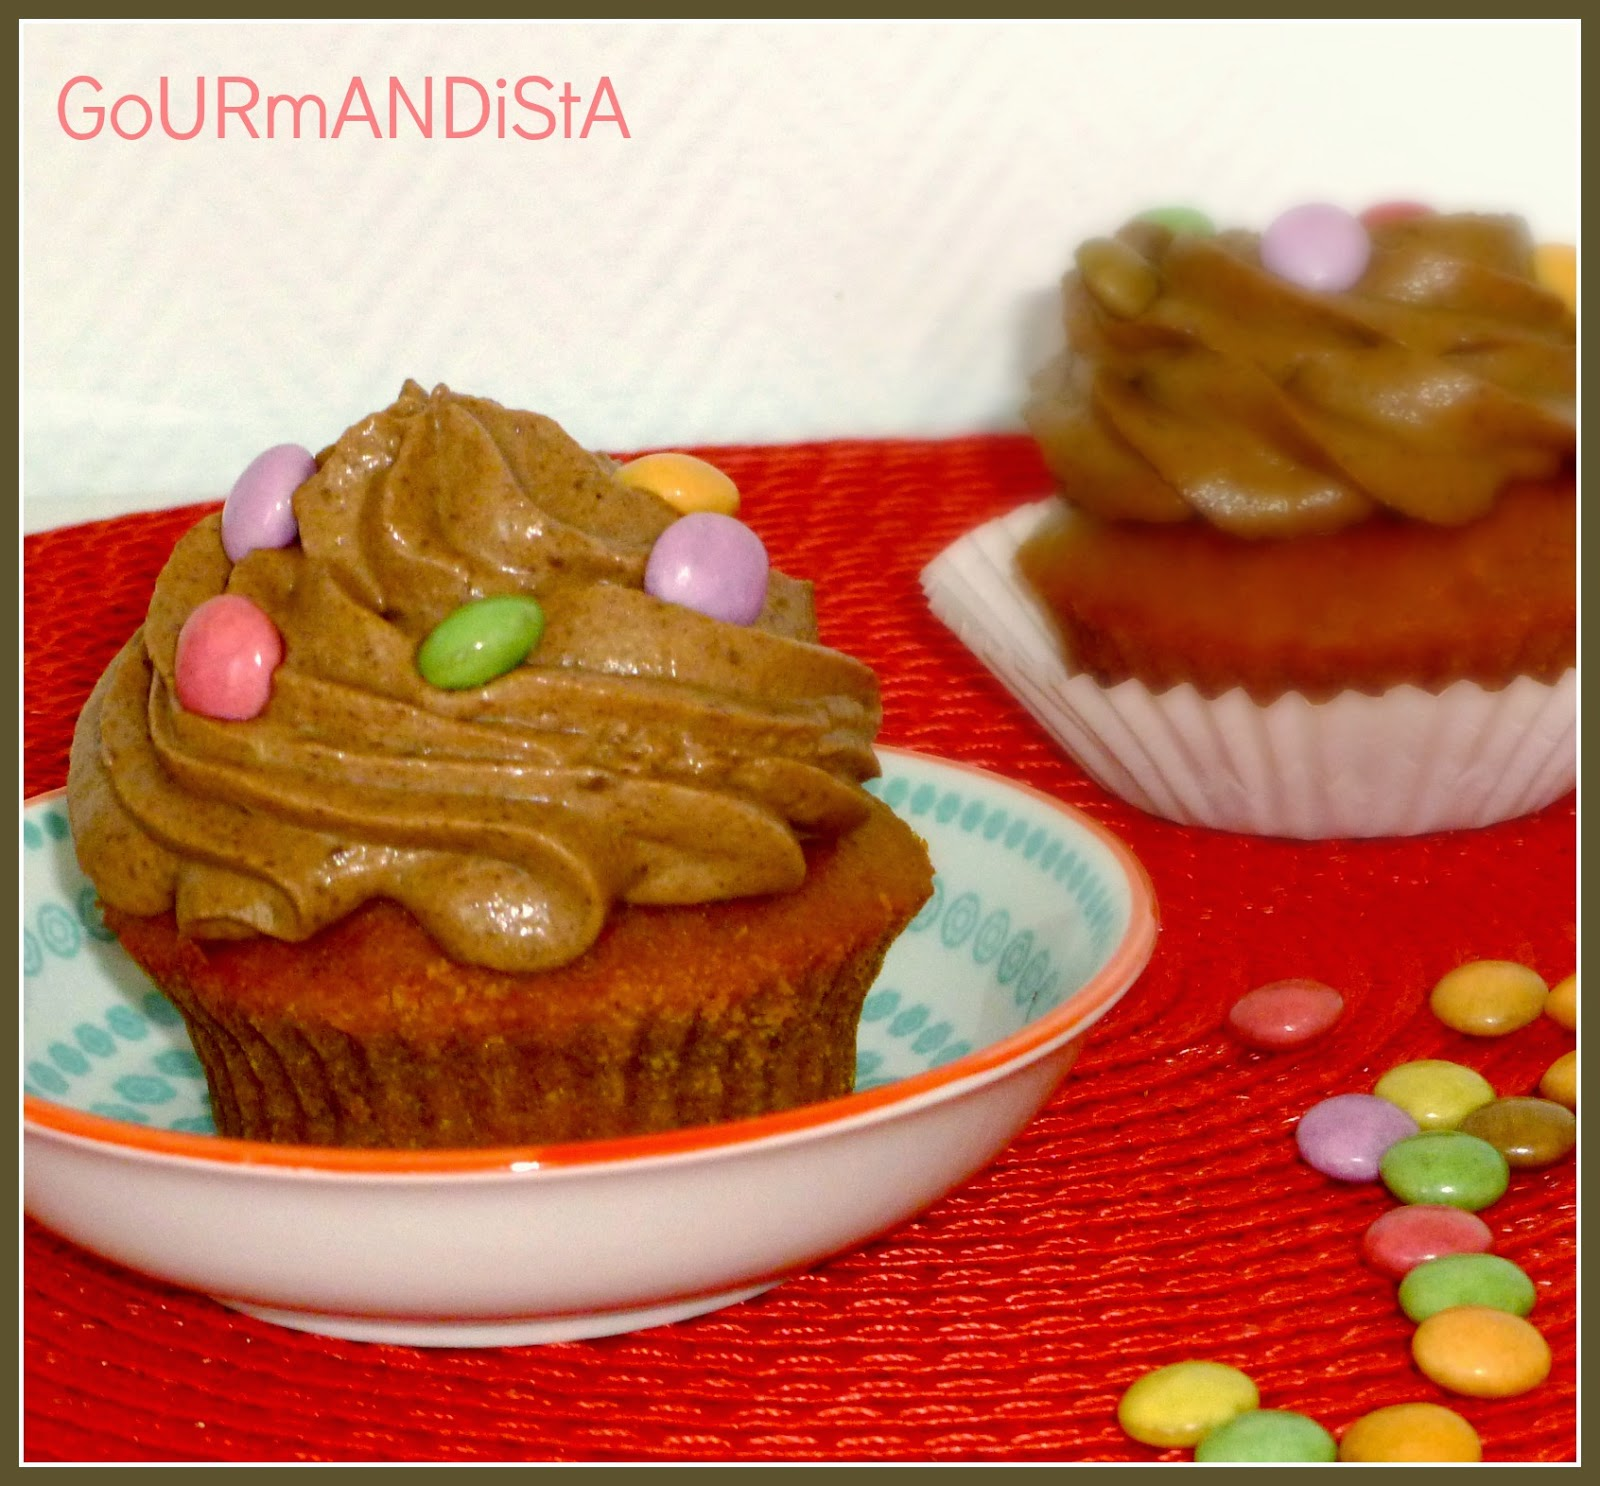 image Cupcakes-potiron-ganache-montée-chocolat